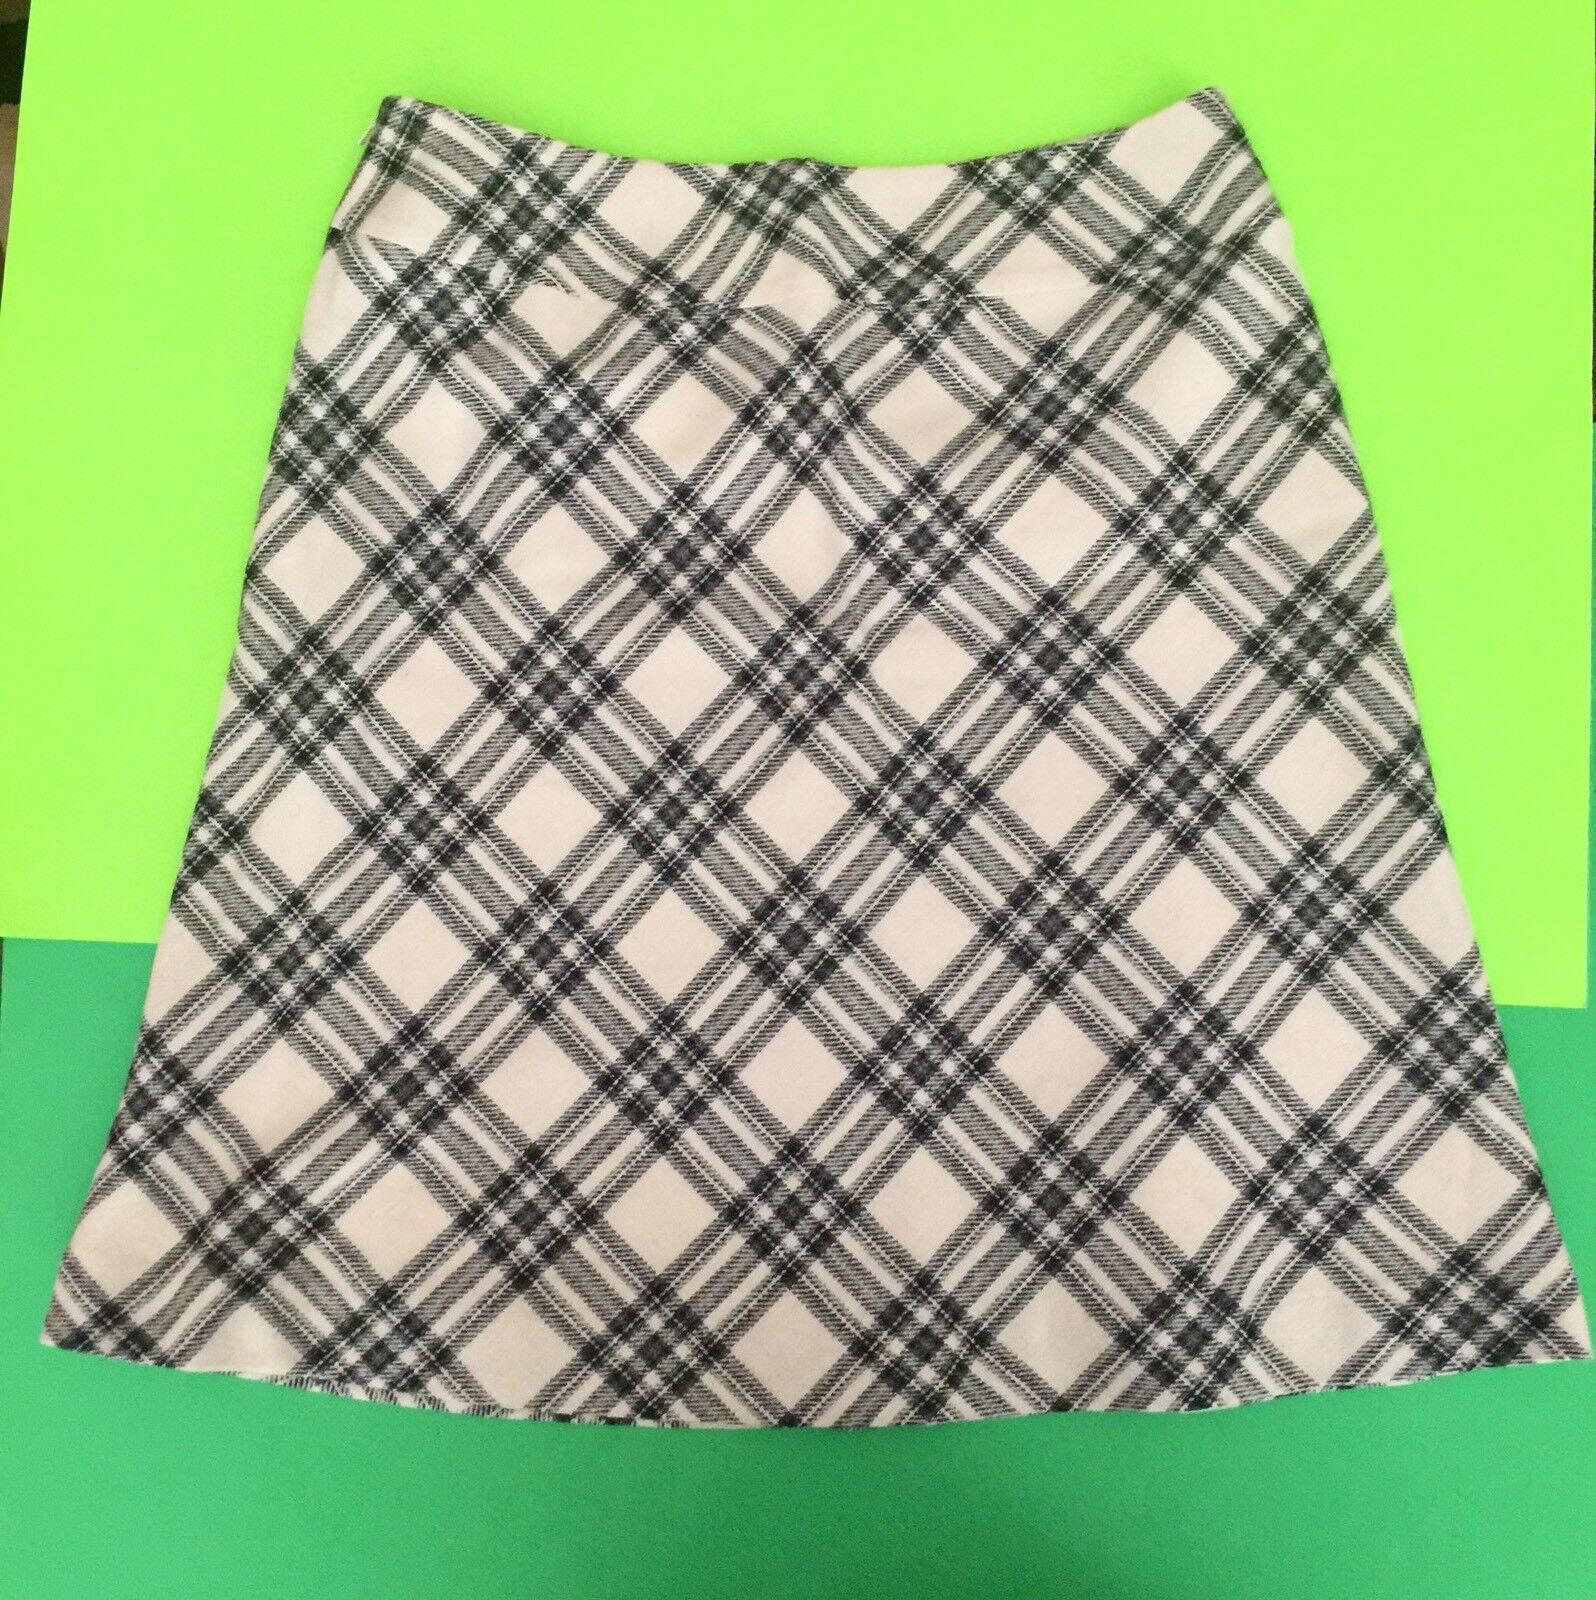 TALBOTS - Women skirt, Size  8, 1 ONLY